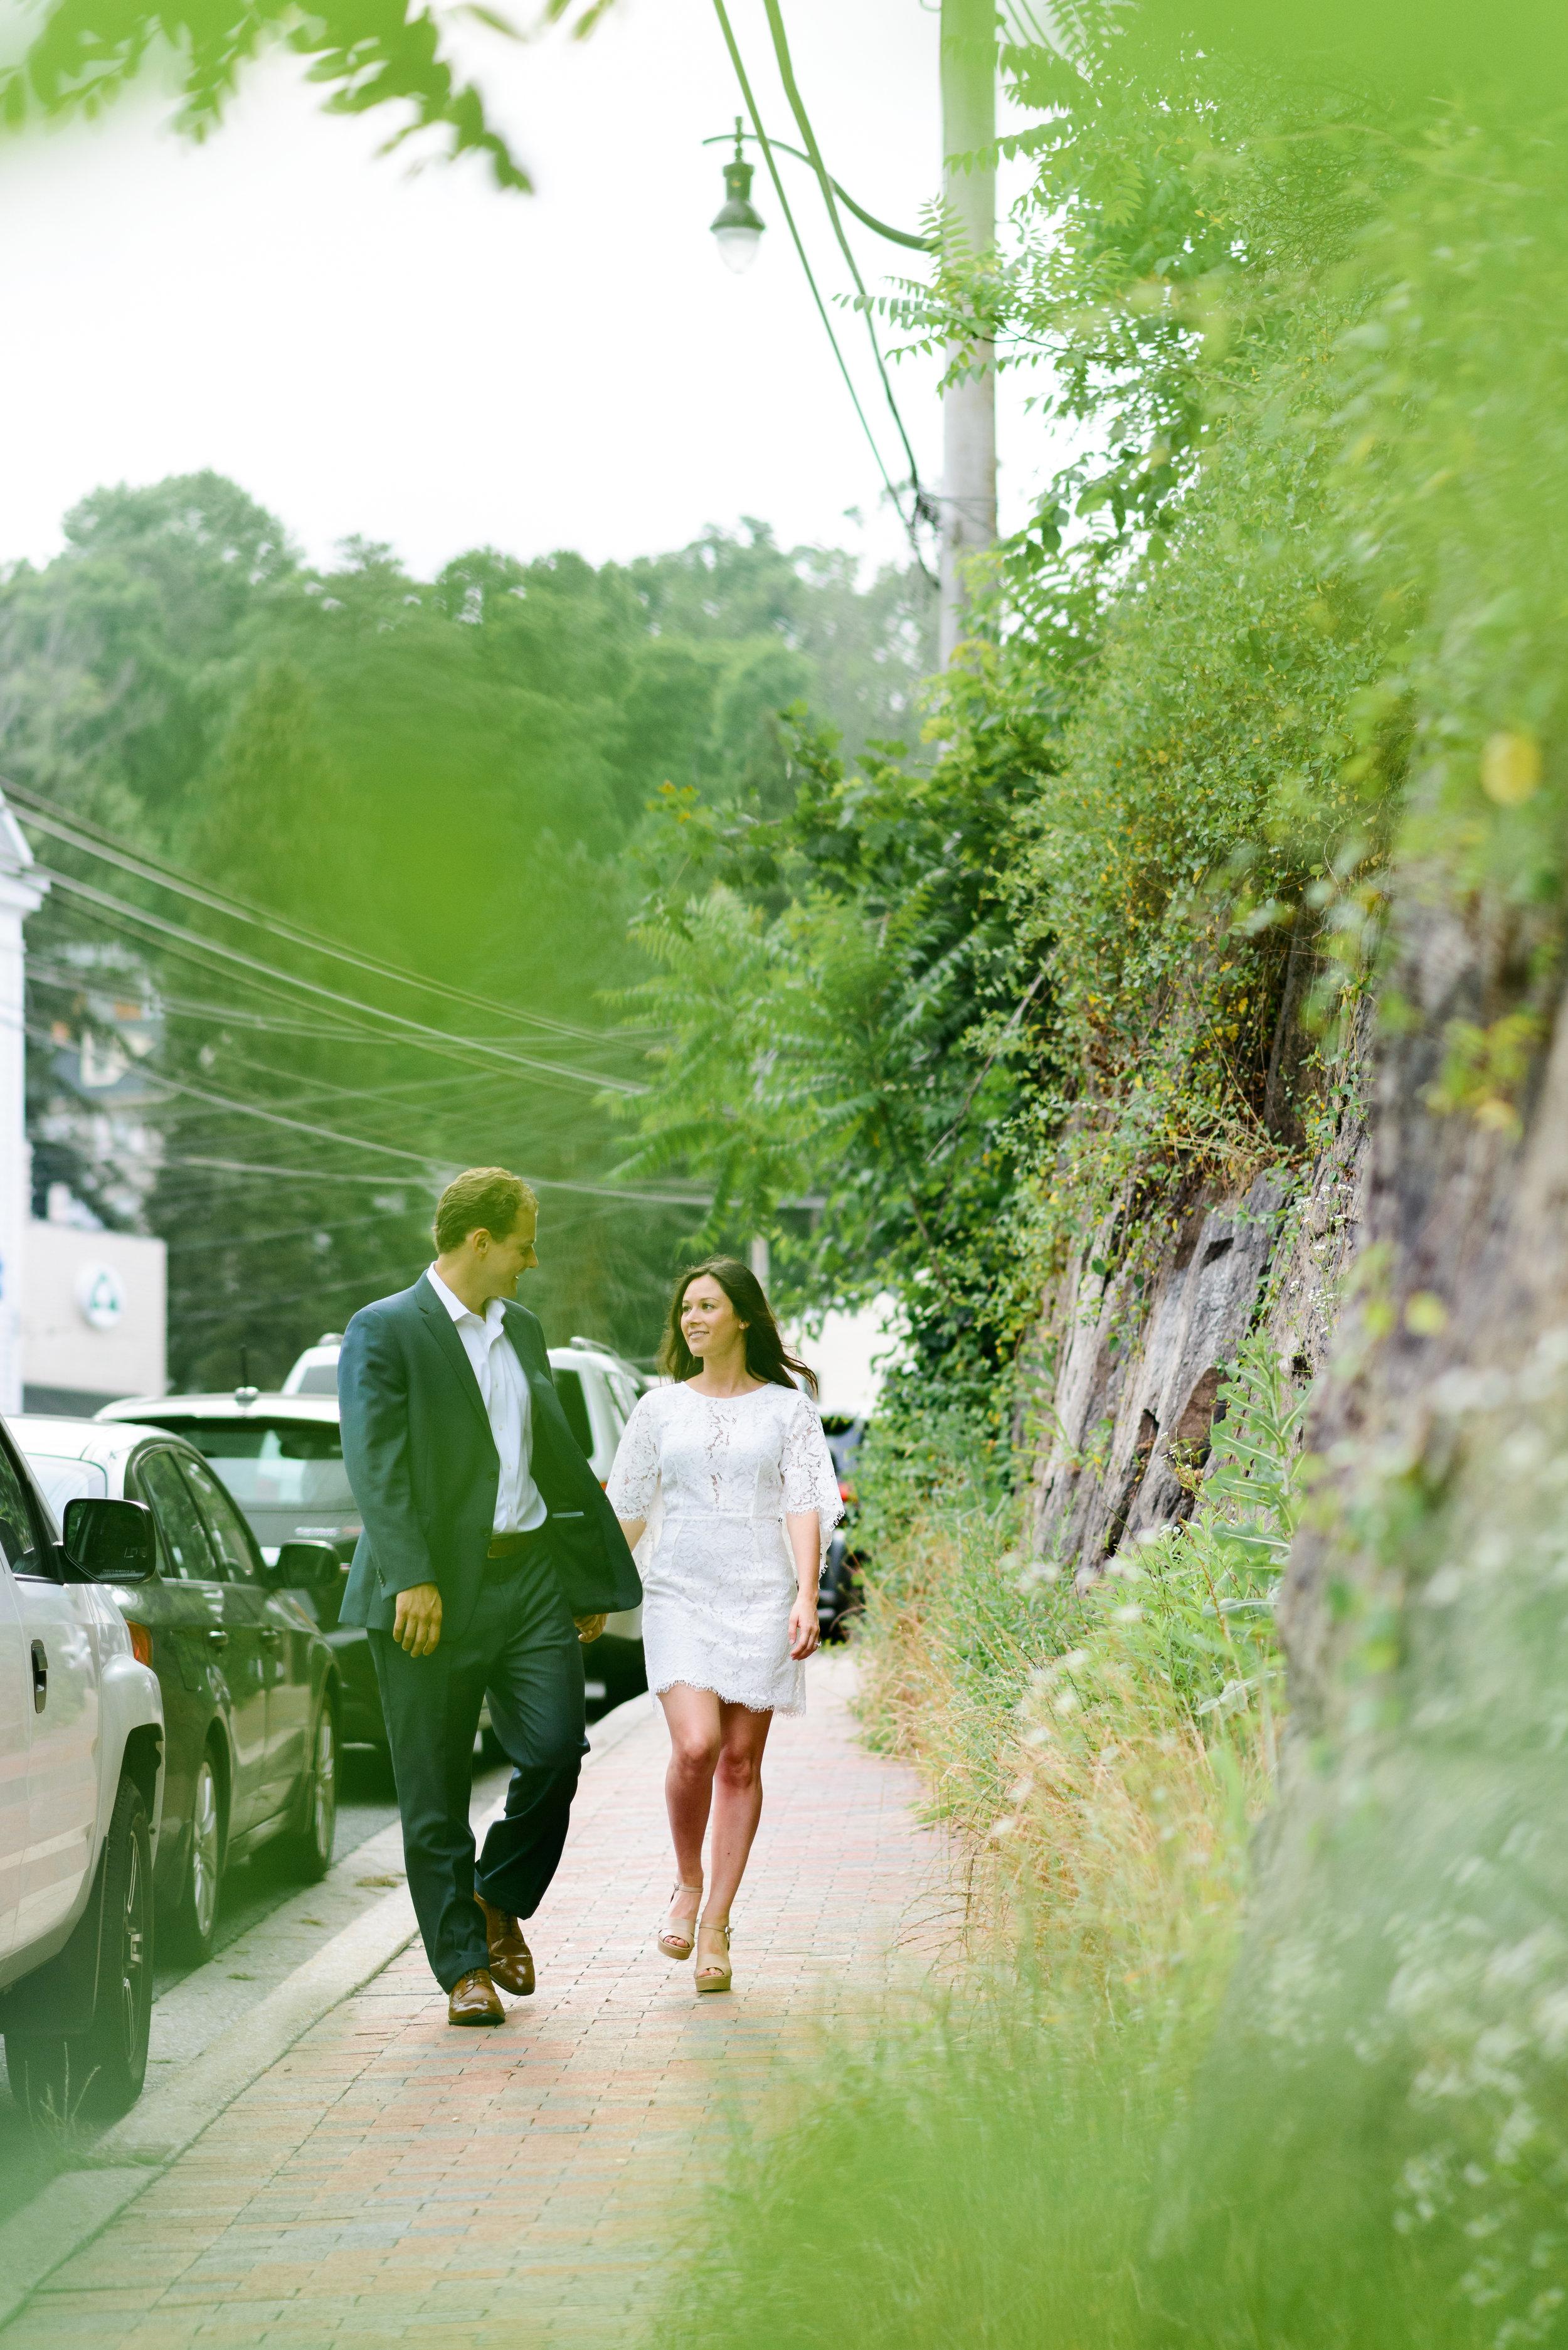 Kirsten-Smith-Photography-Amanda-Joe-Engagement-69.jpg